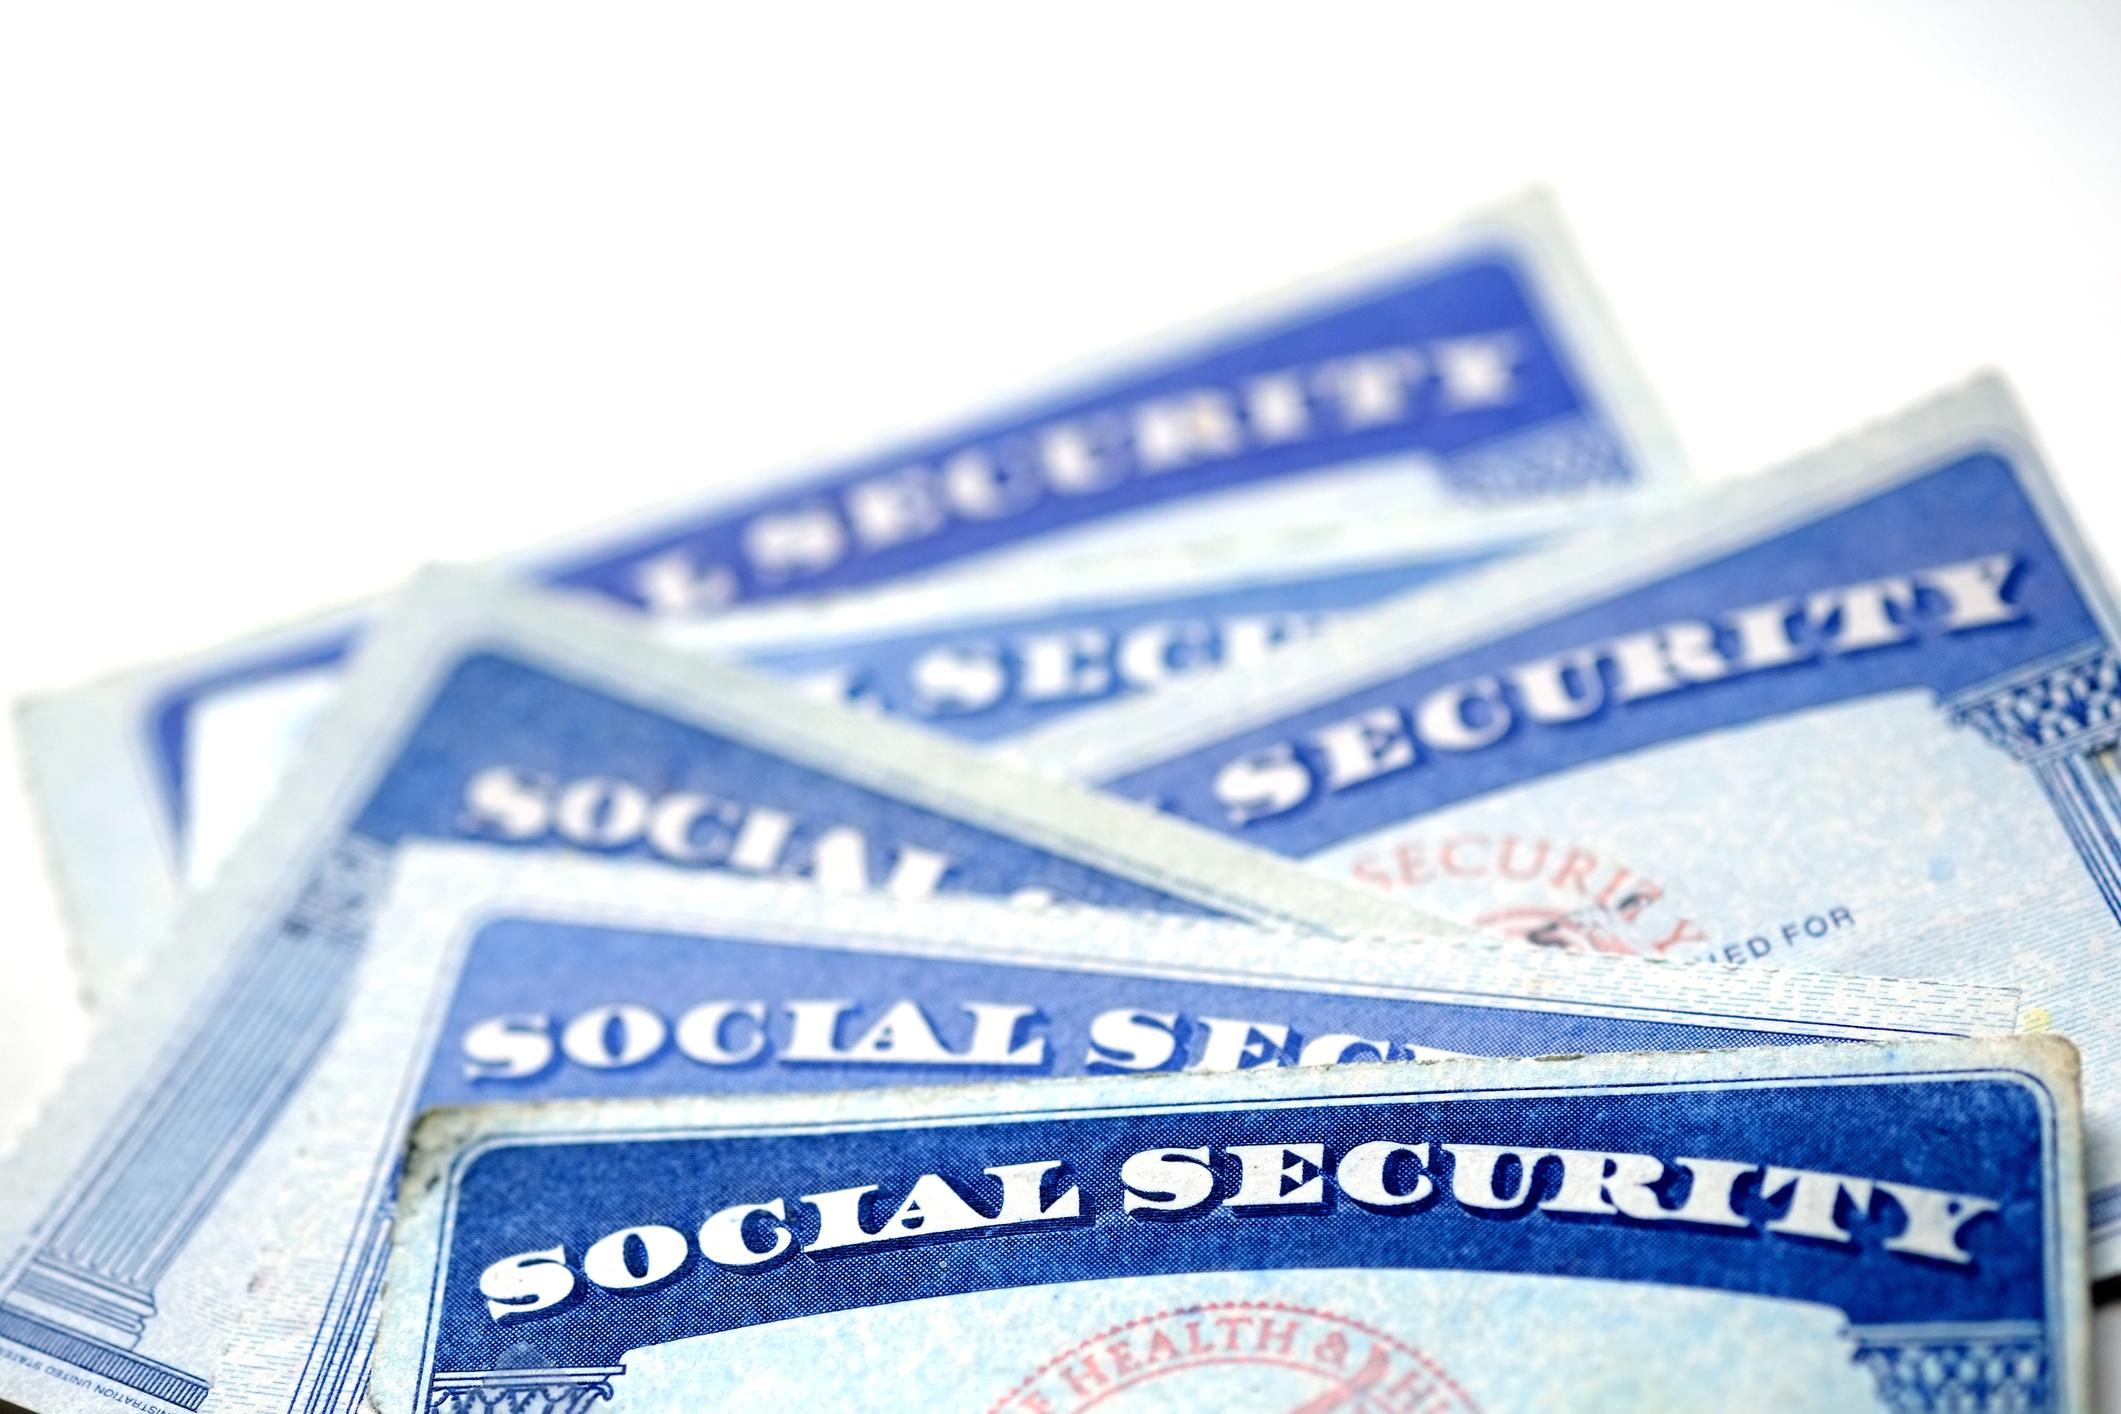 A half-dozen Social Security cards messily laid on a counter.